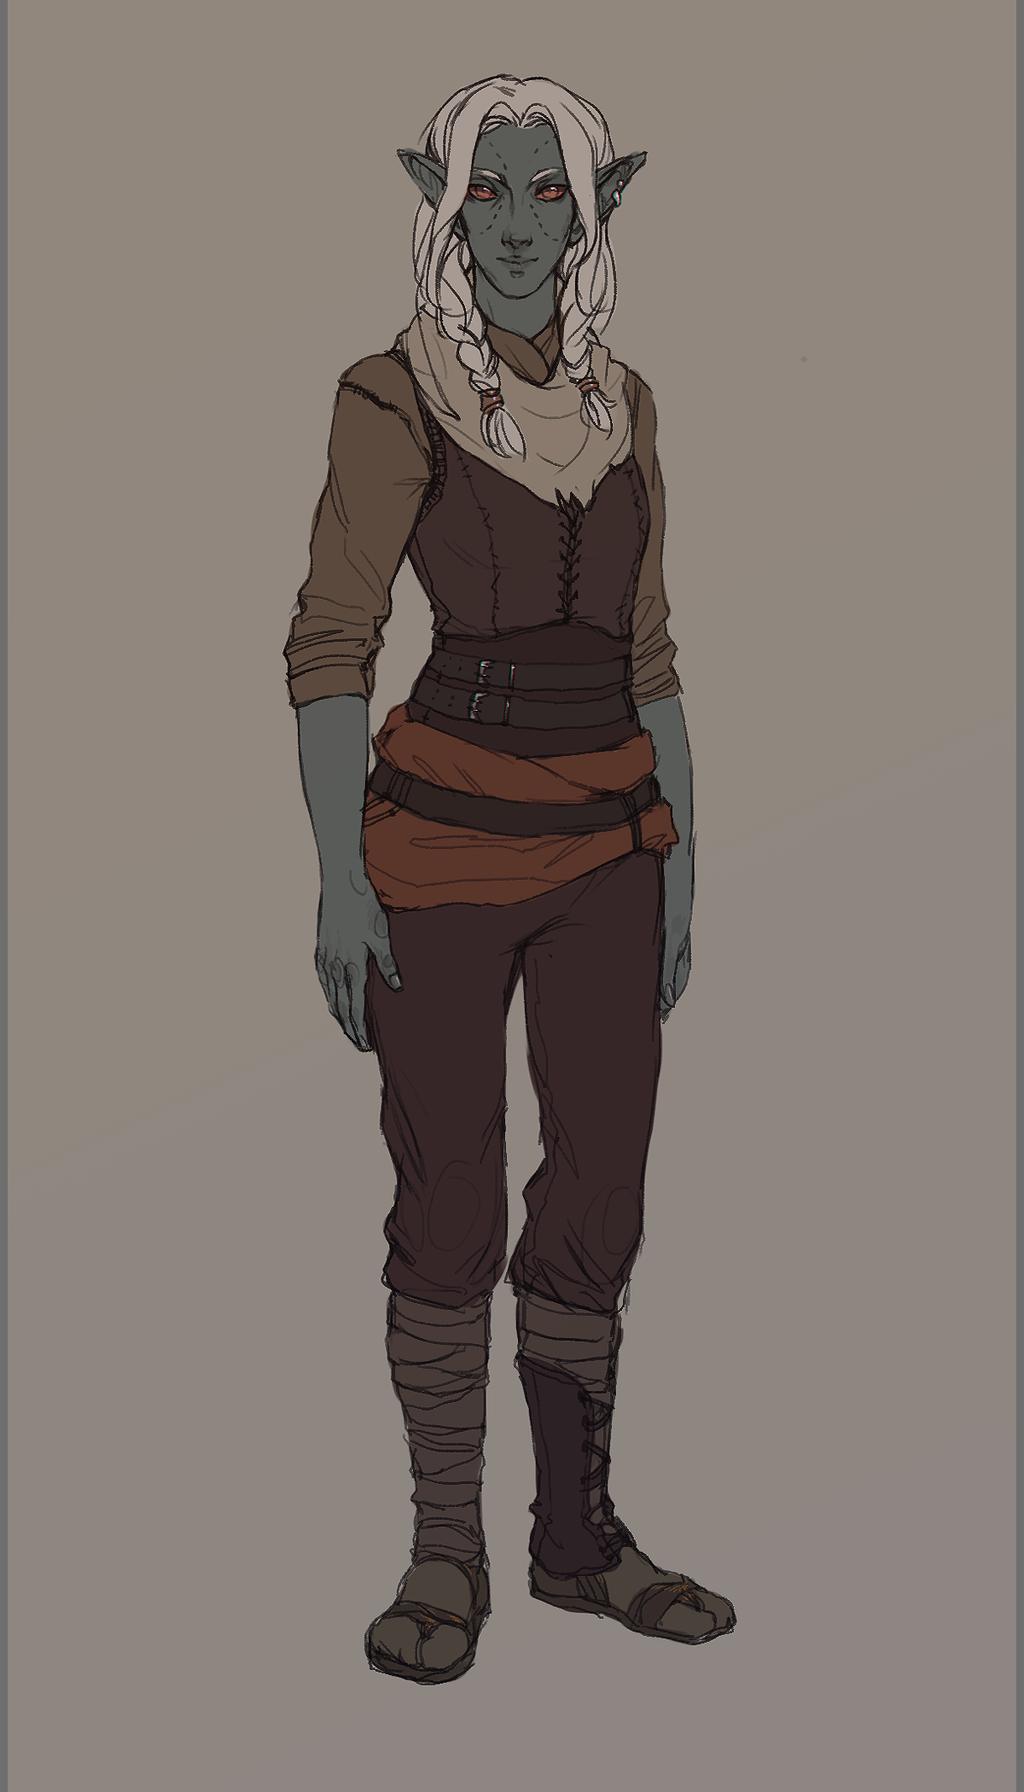 Skyrim Character Design Ideas : Dunmer tumblr elder scrolls pinterest skyrim